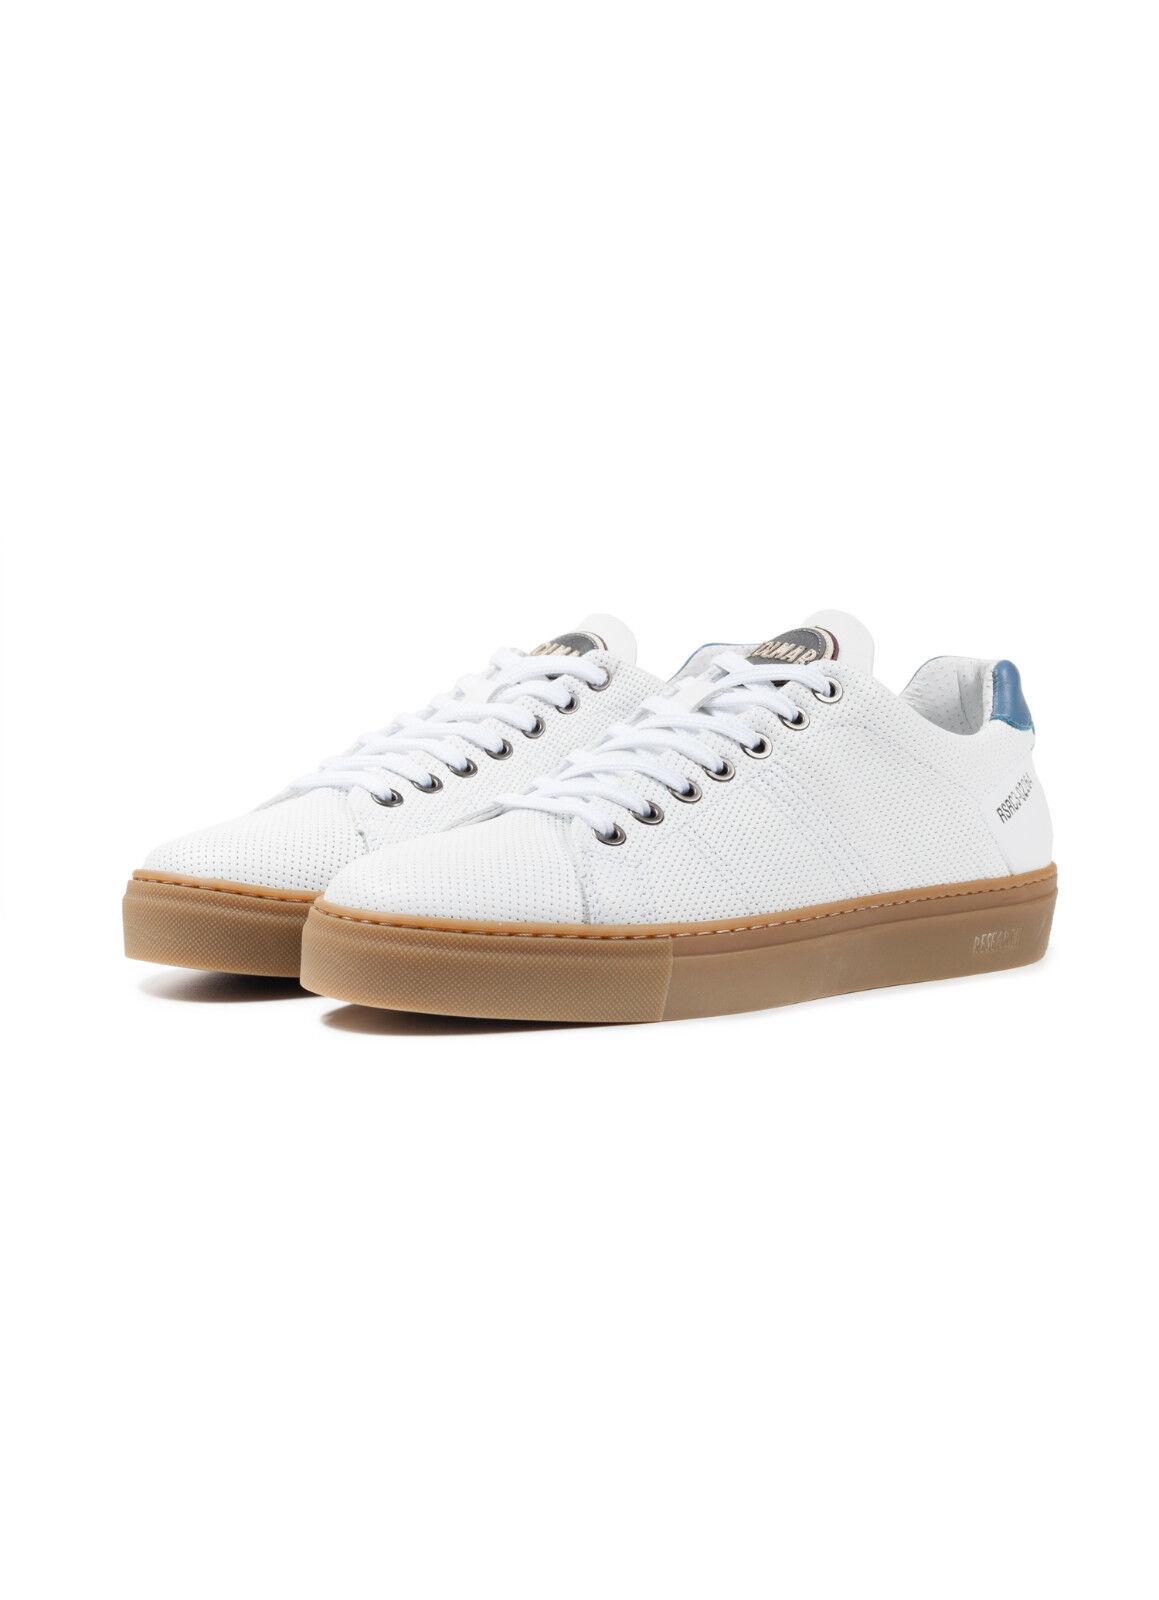 Sneakers Uomo COLMAR Bradbury Microforata Fresh 2018 Pelle Liscia Microforata Bradbury Scarpe NUOVE 99d637